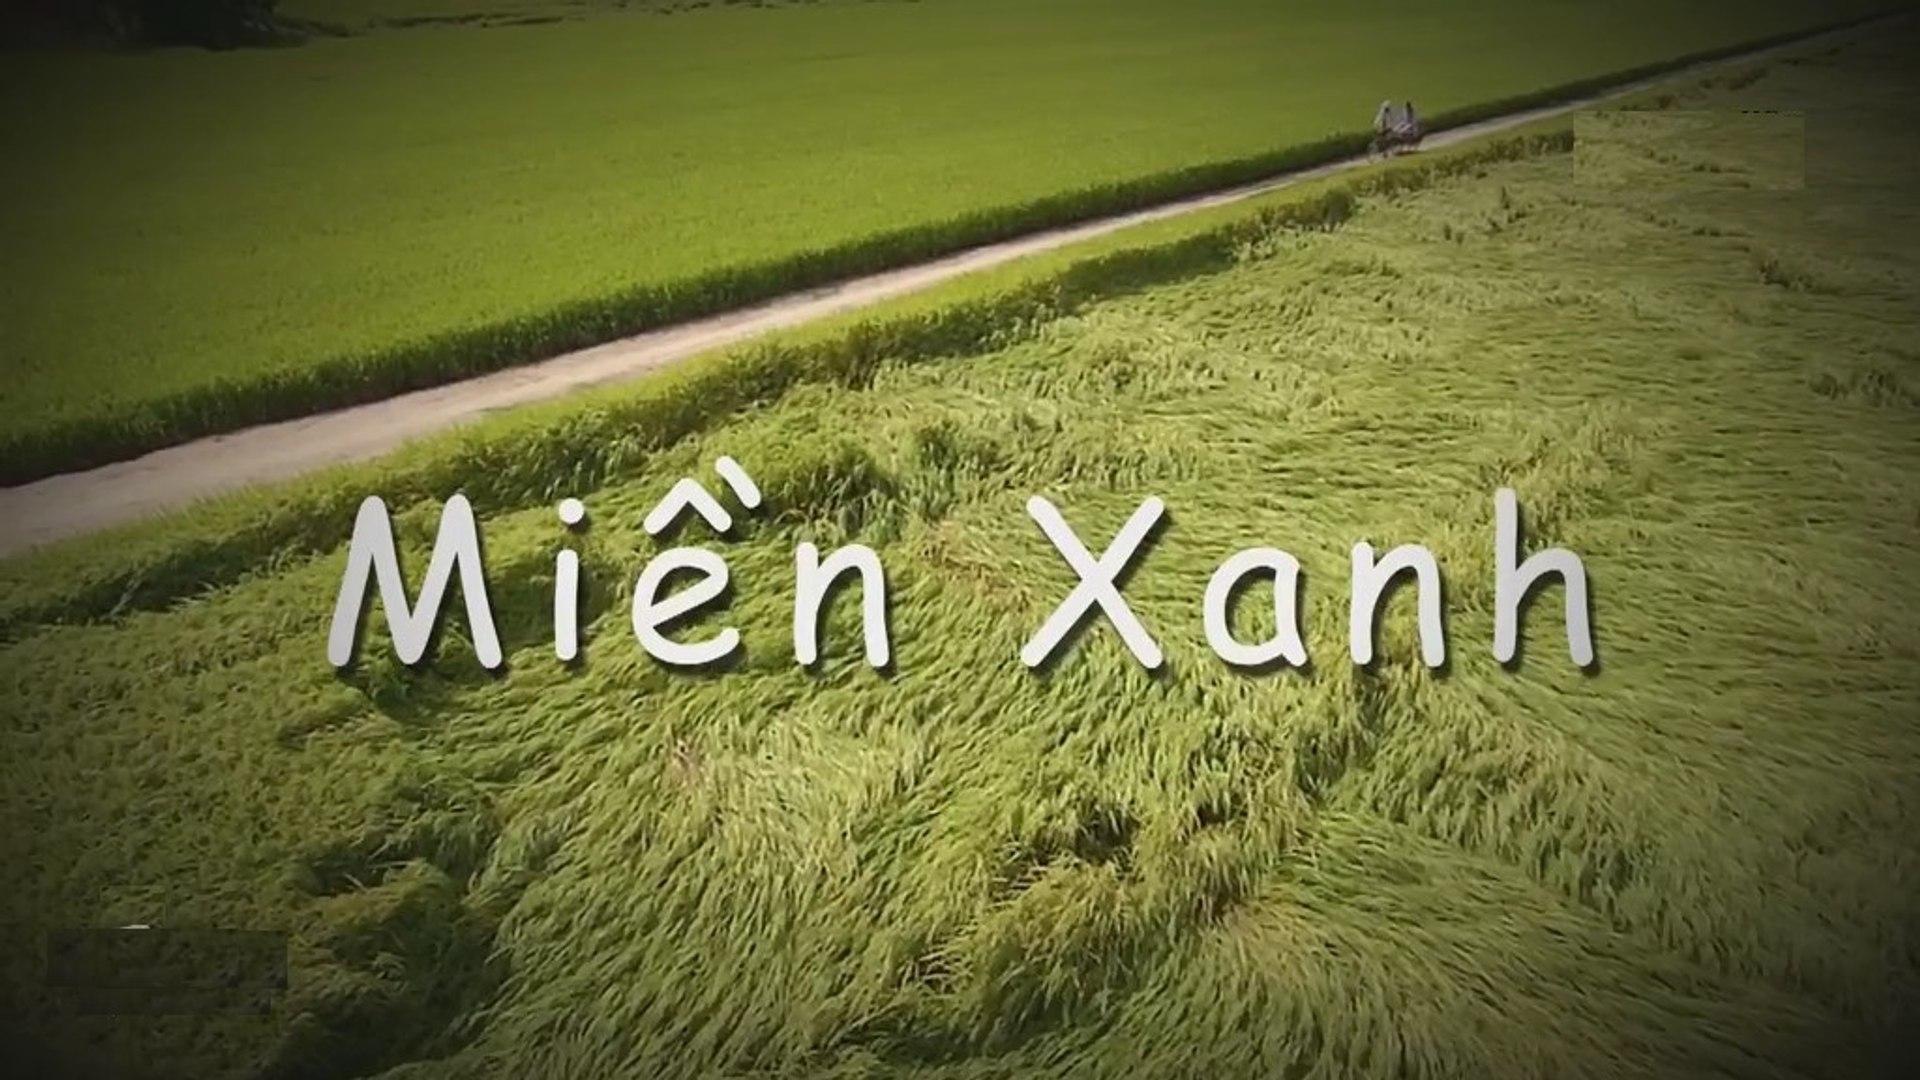 Phim Miền Xanh Tập 26 - Phim Việt Nam (HTV9)